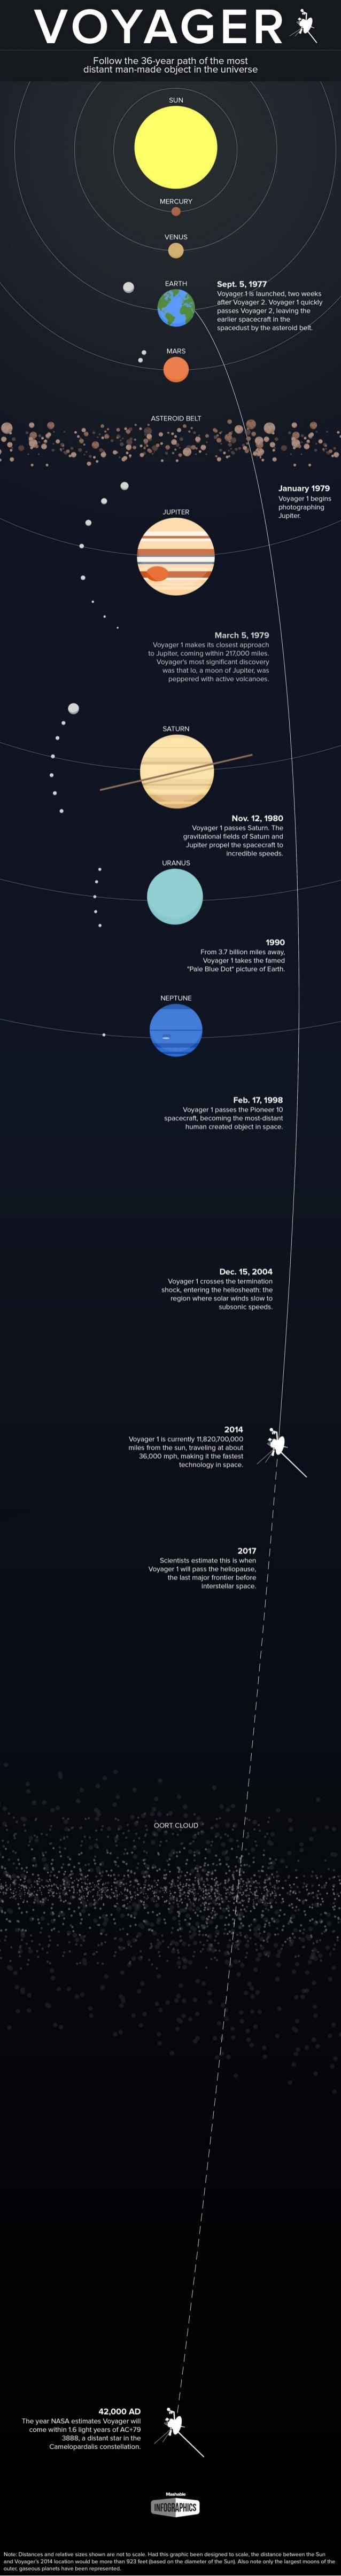 Mapping Voyager 1's 36-Year Trek Through Space